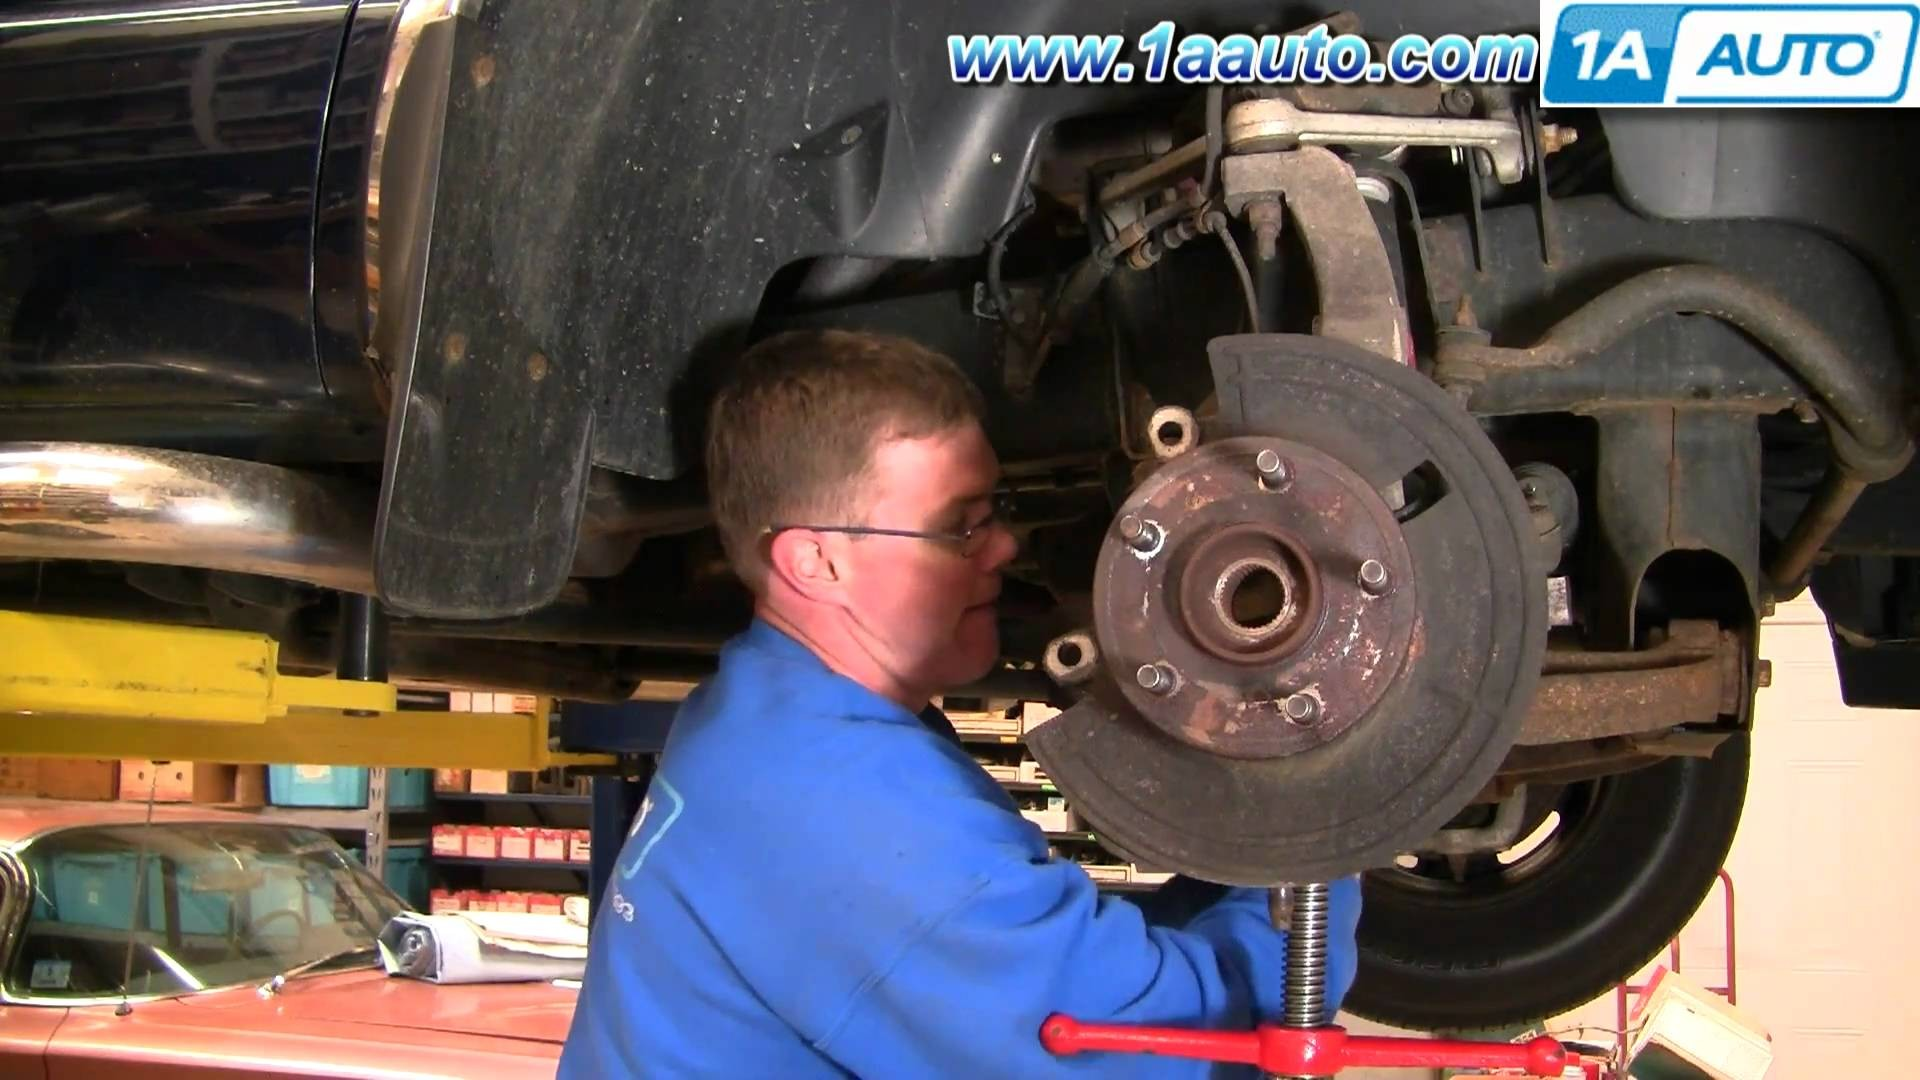 Dodge Ram Parts Diagram How to Install Repair Replace Front Wheel Bearing Hub Dodge Ram 1500 Of Dodge Ram Parts Diagram